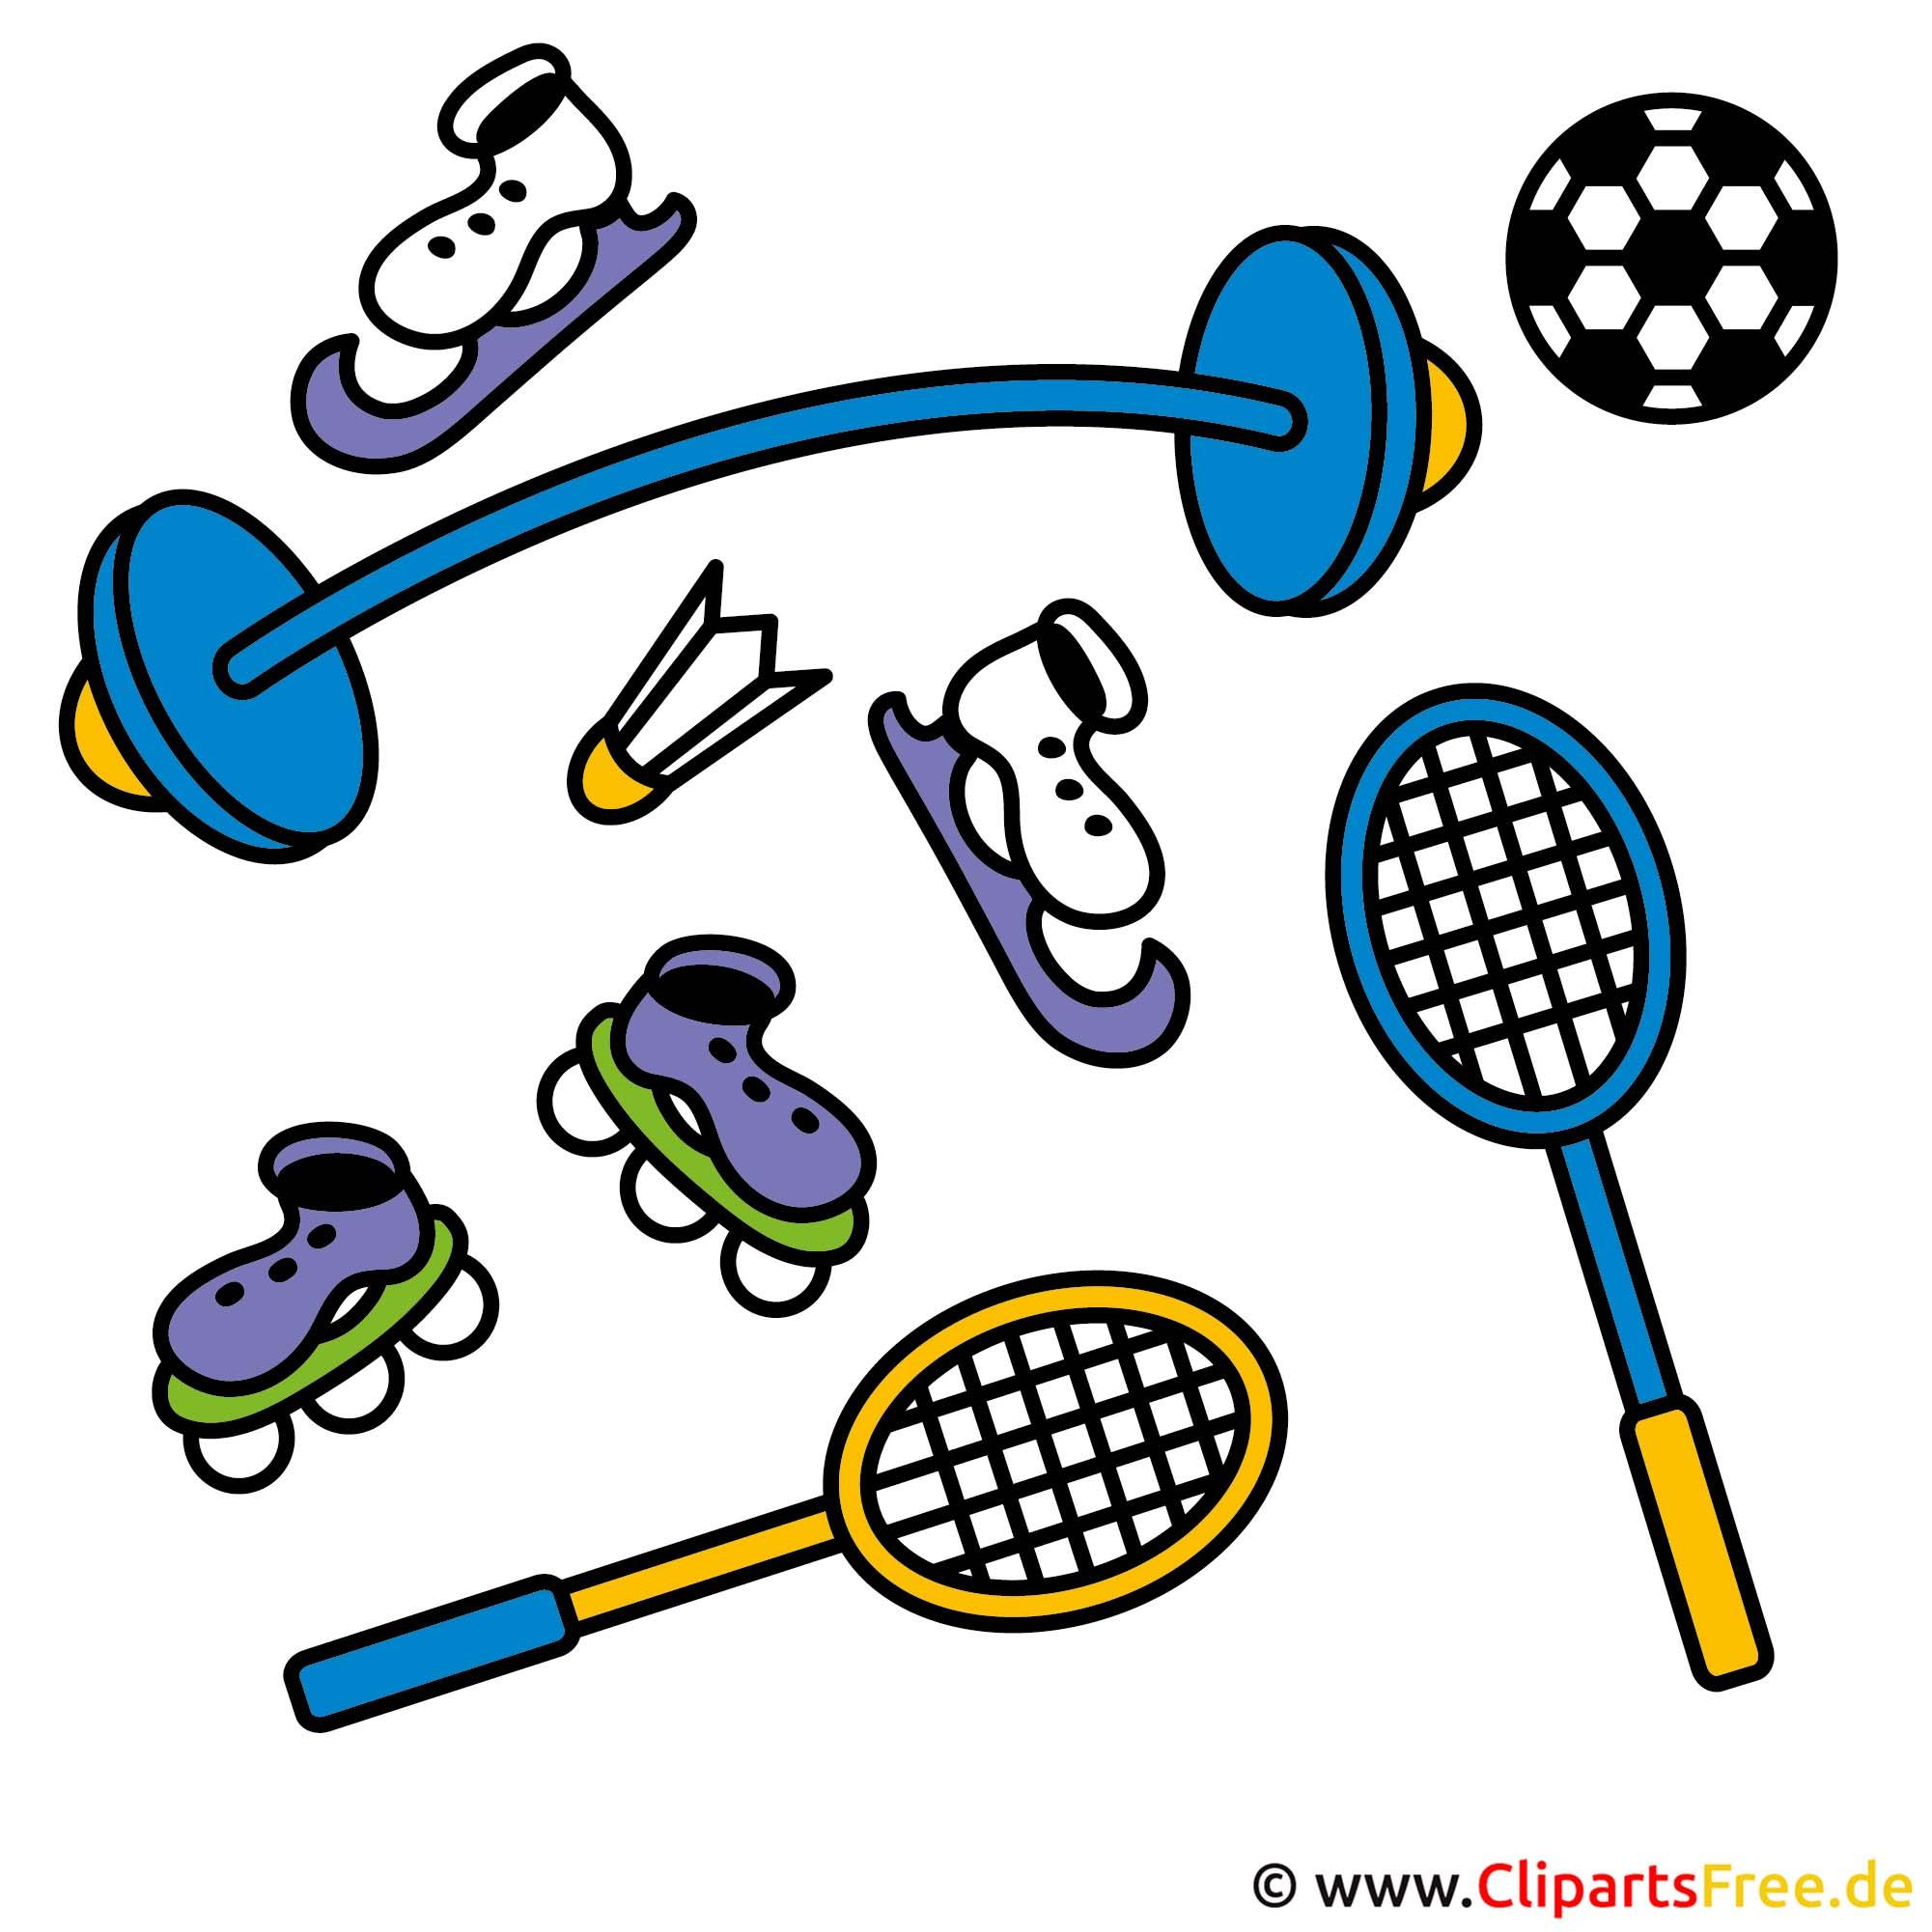 sports clip art download free free sports clipart borders free sports clipart for teachers